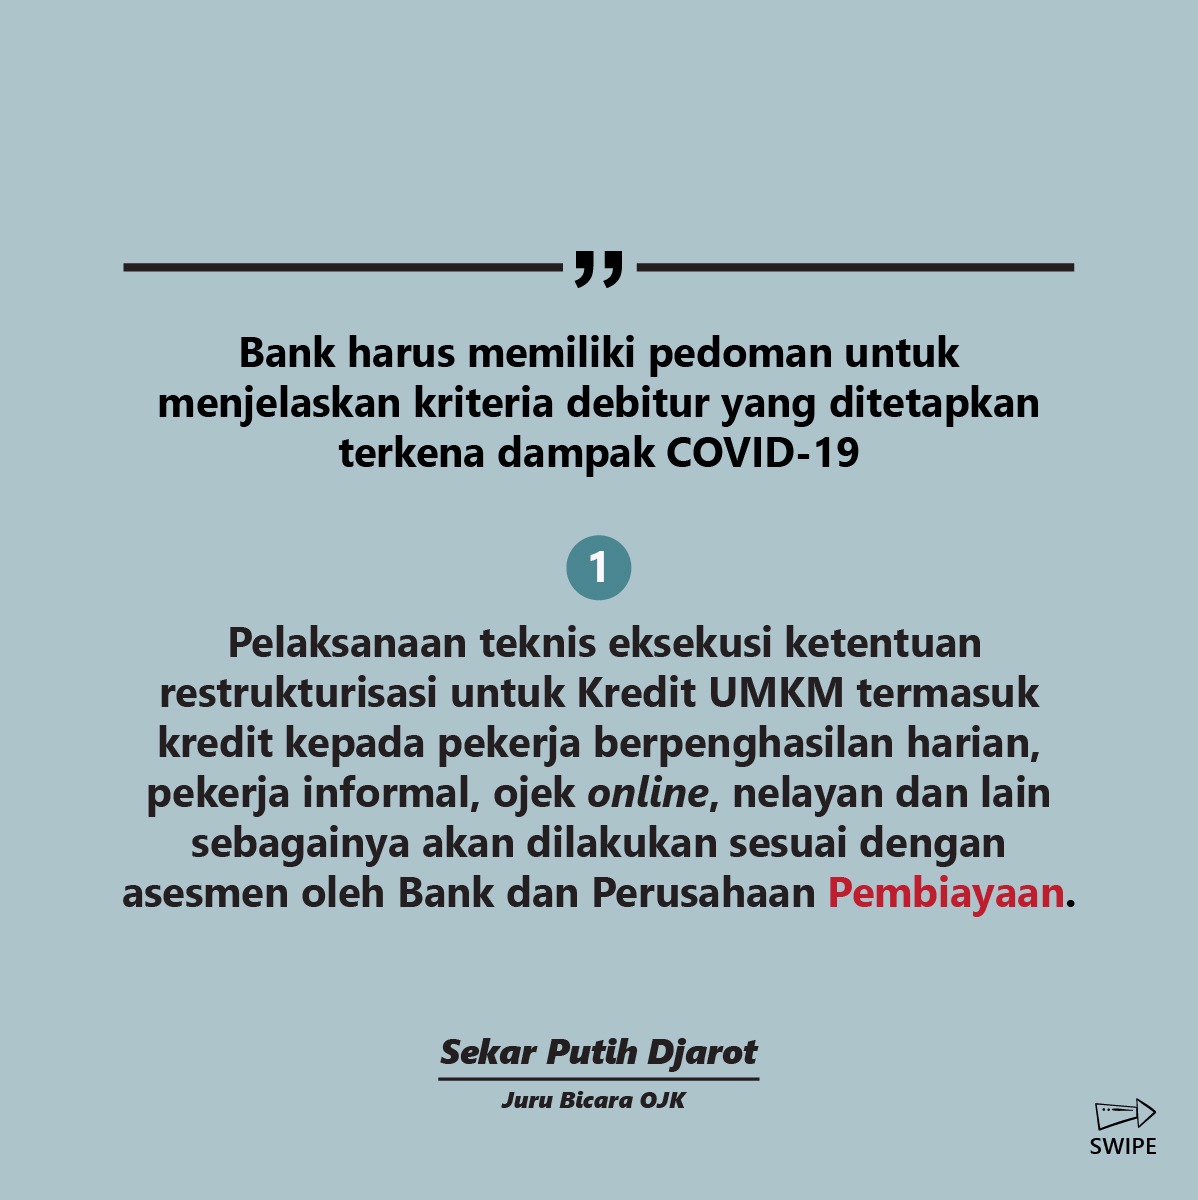 Ojk Indonesia On Twitter Sobat Ojk Bagi Yang Penasaran Dengan